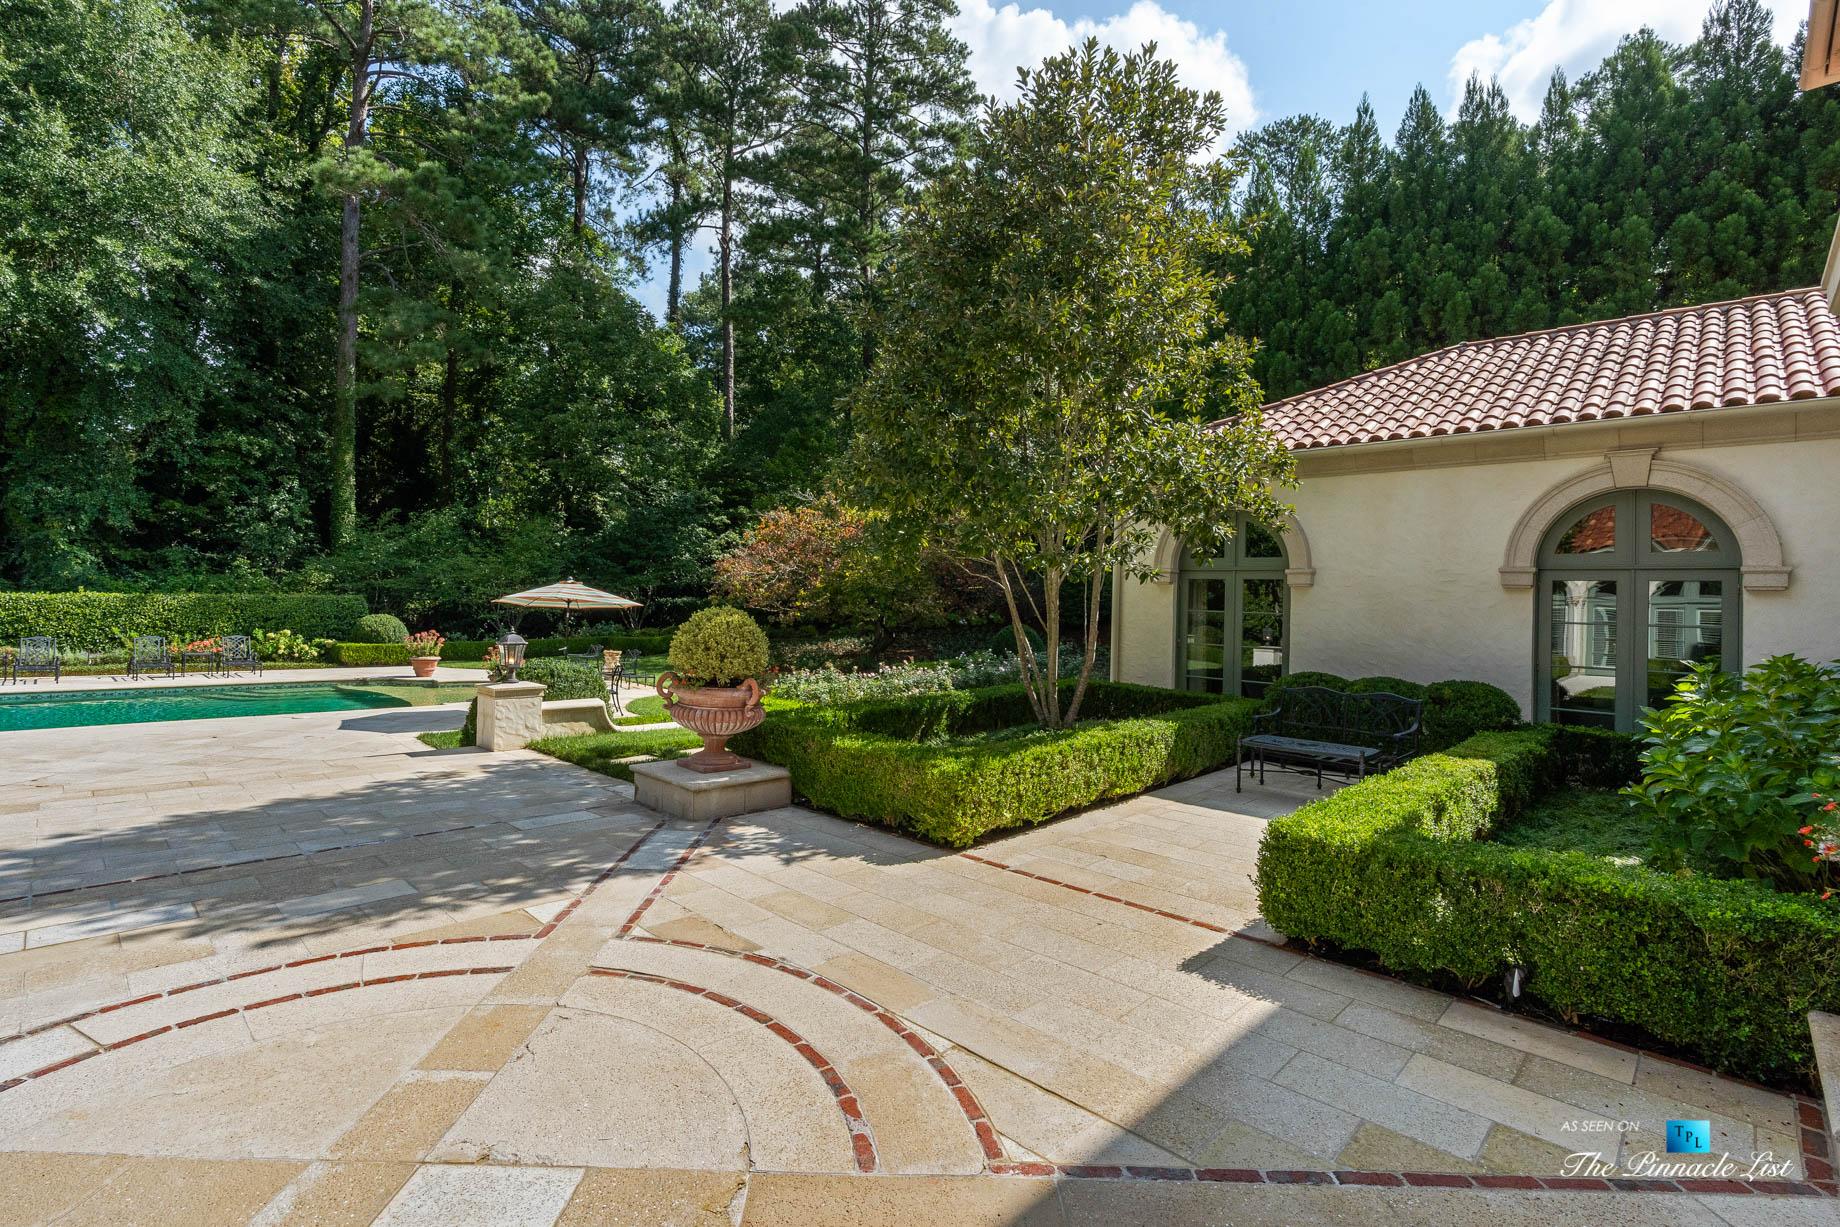 439 Blackland Rd NW, Atlanta, GA, USA - Backyard Pool Grounds - Luxury Real Estate - Tuxedo Park Mediterranean Mansion Home